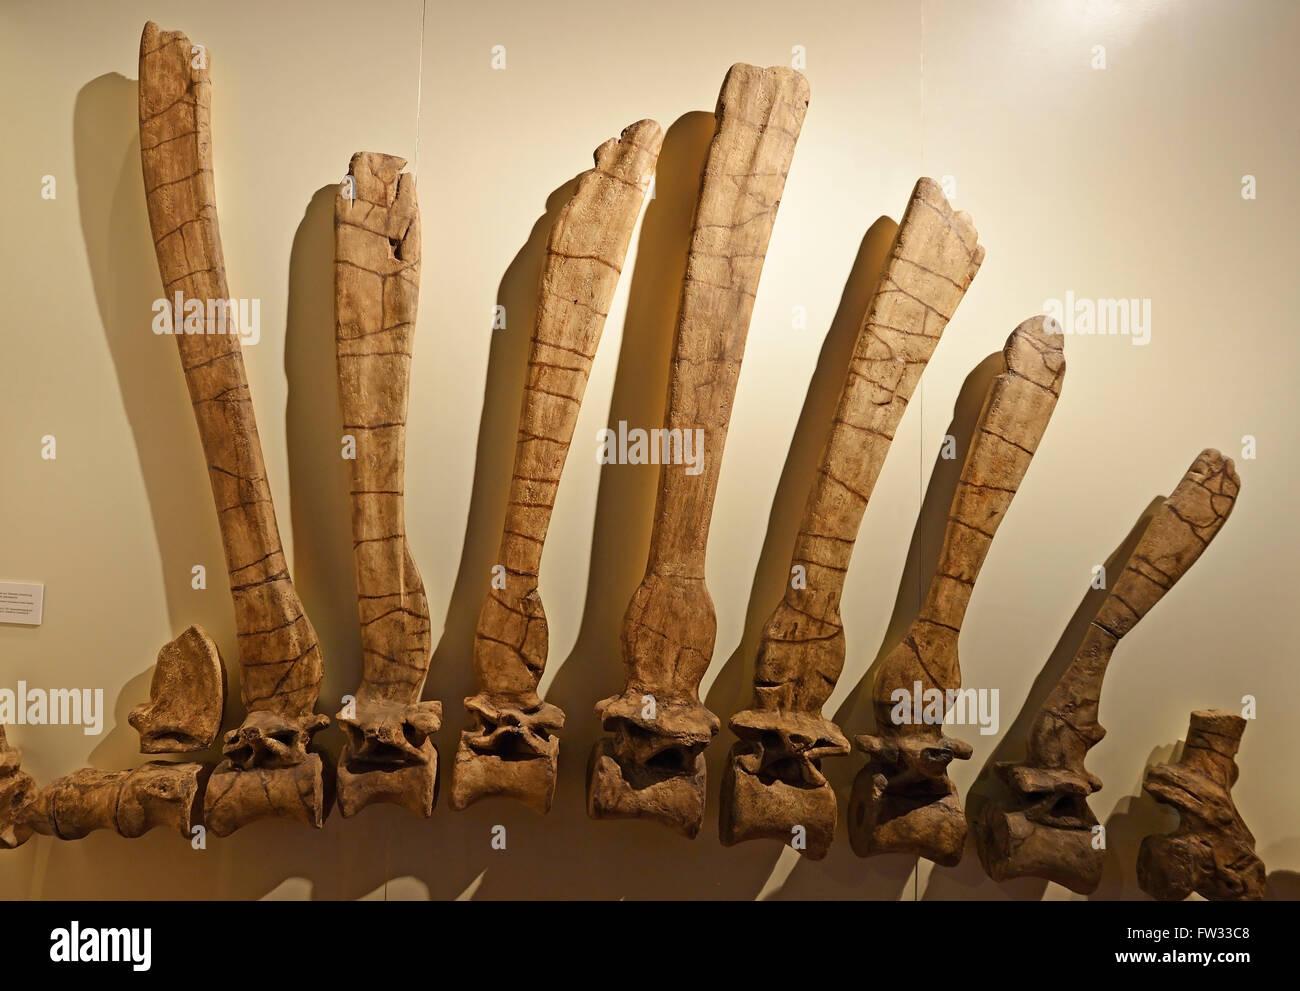 Part of the spine and back bones of the biggest carnivorous dinosaur (Spinosaurus aegyptiacus), Naturkundemuseum - Stock Image